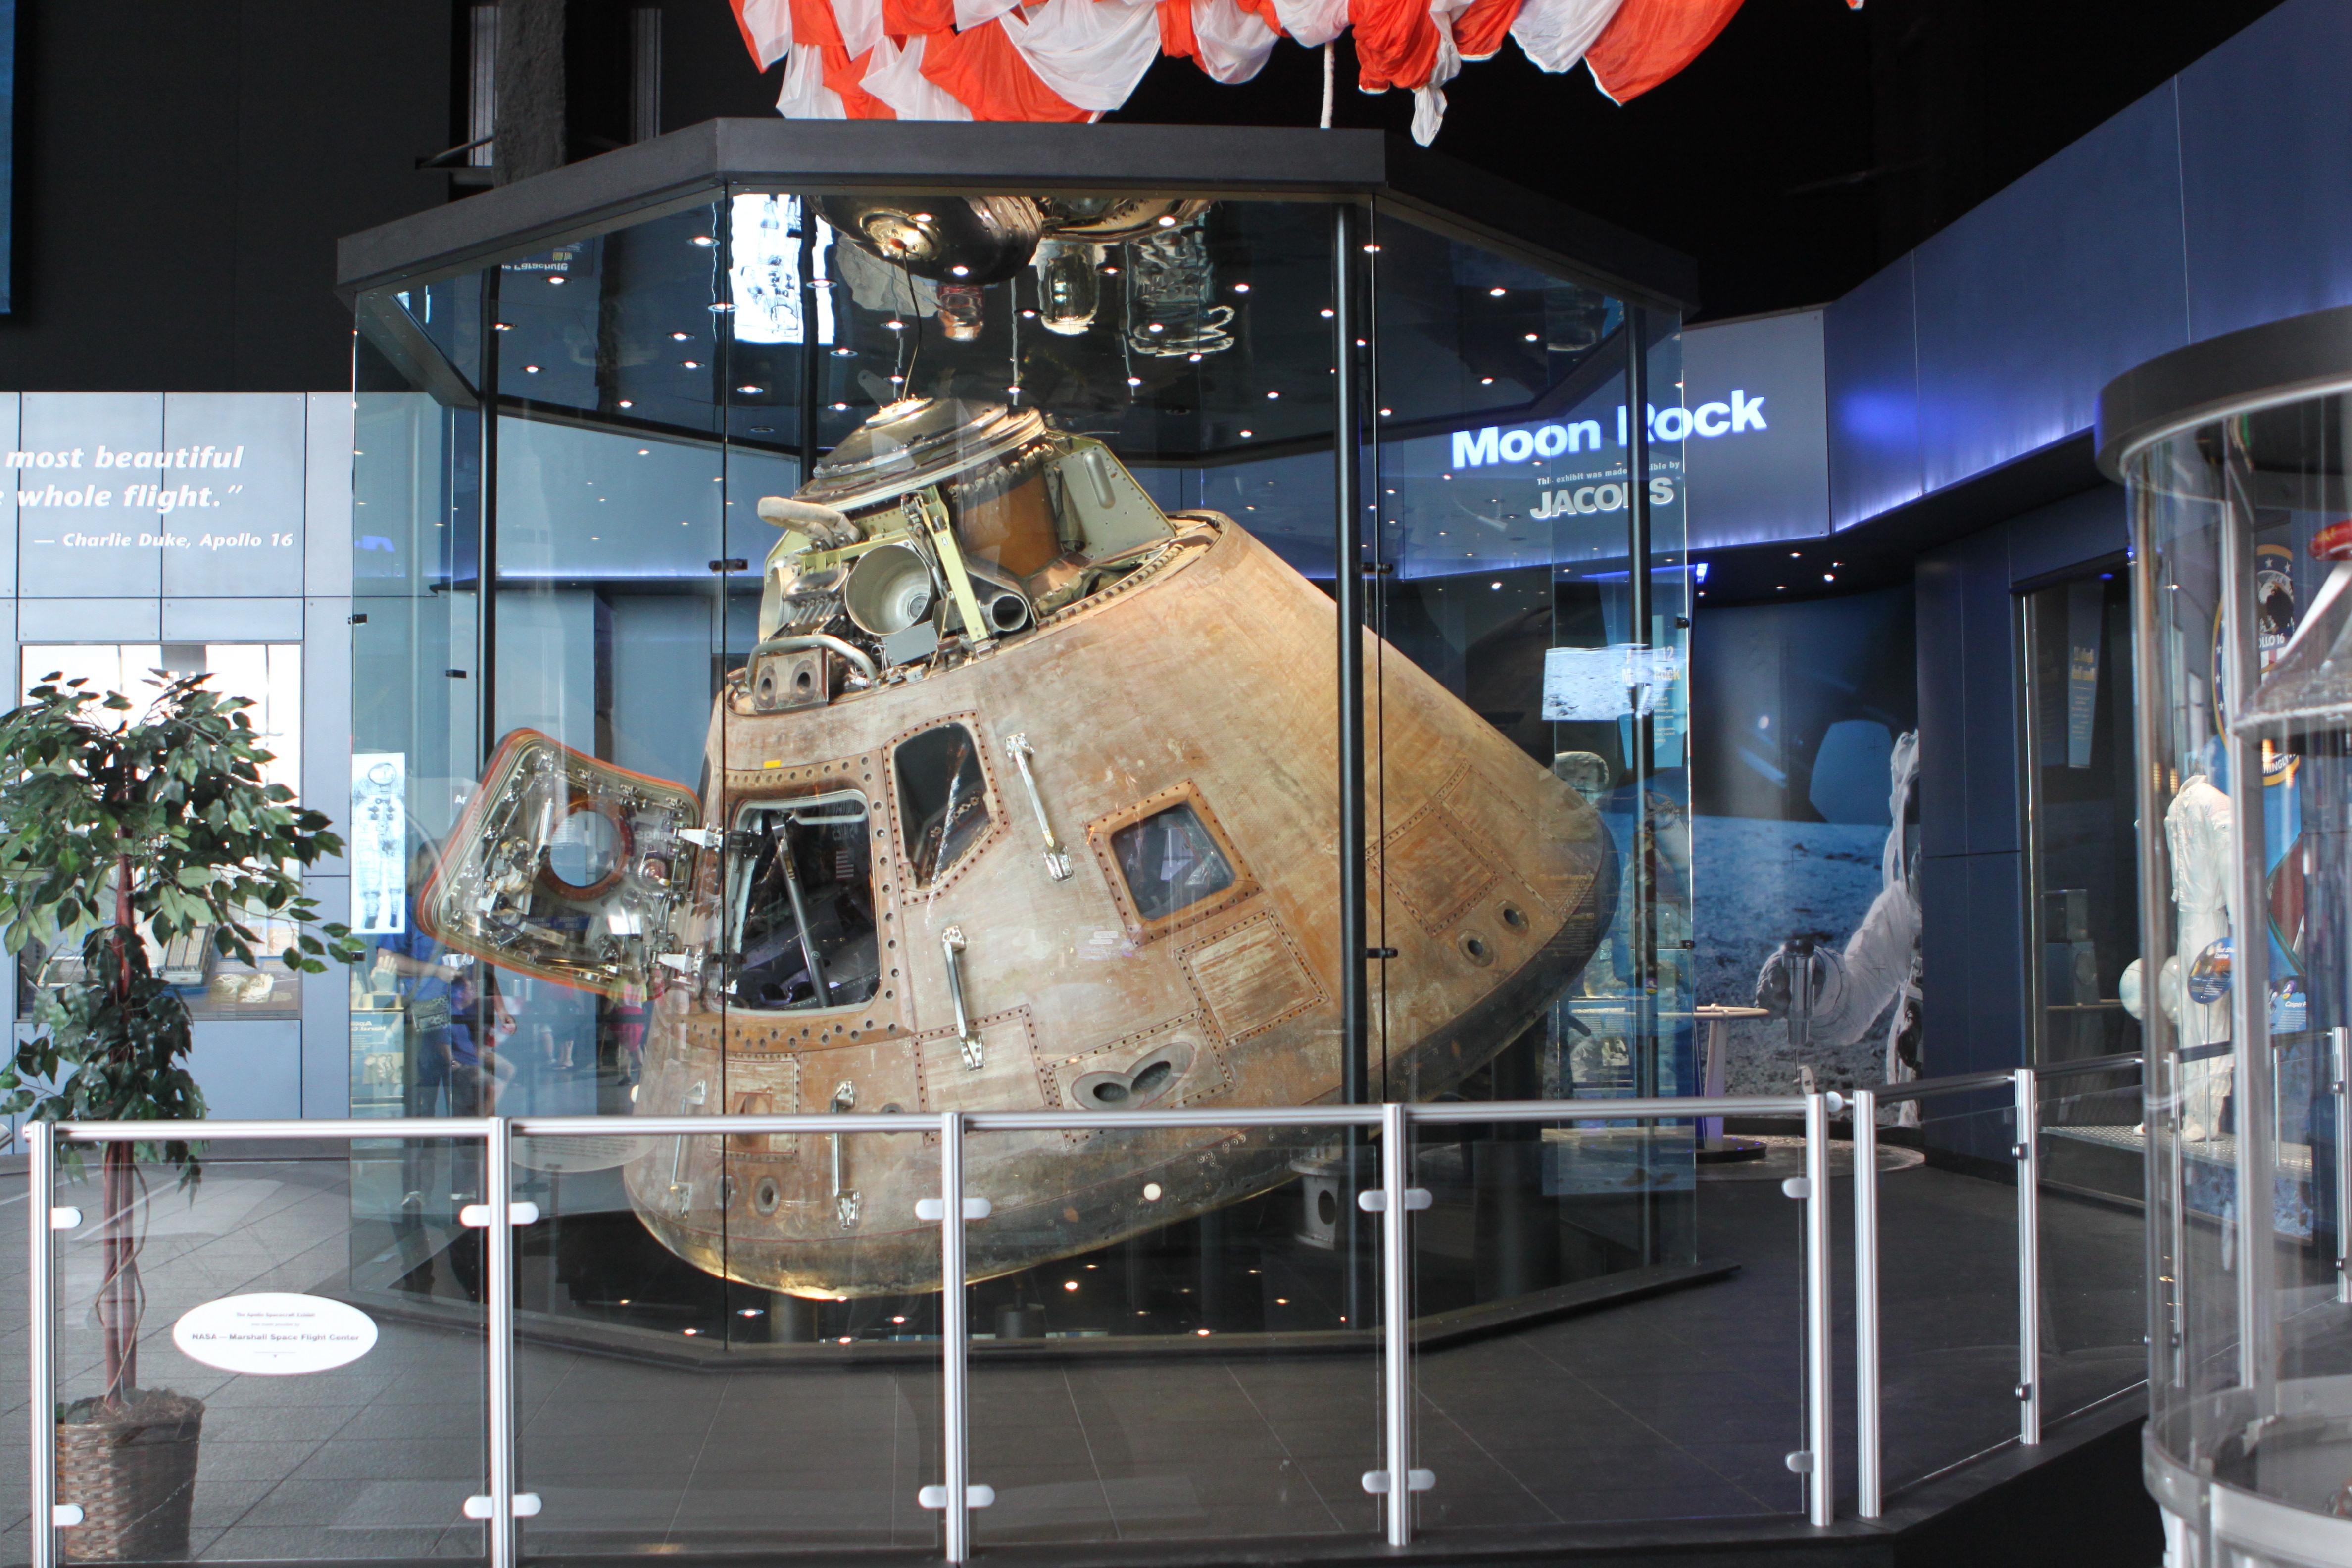 apollo 17 capsule - photo #48